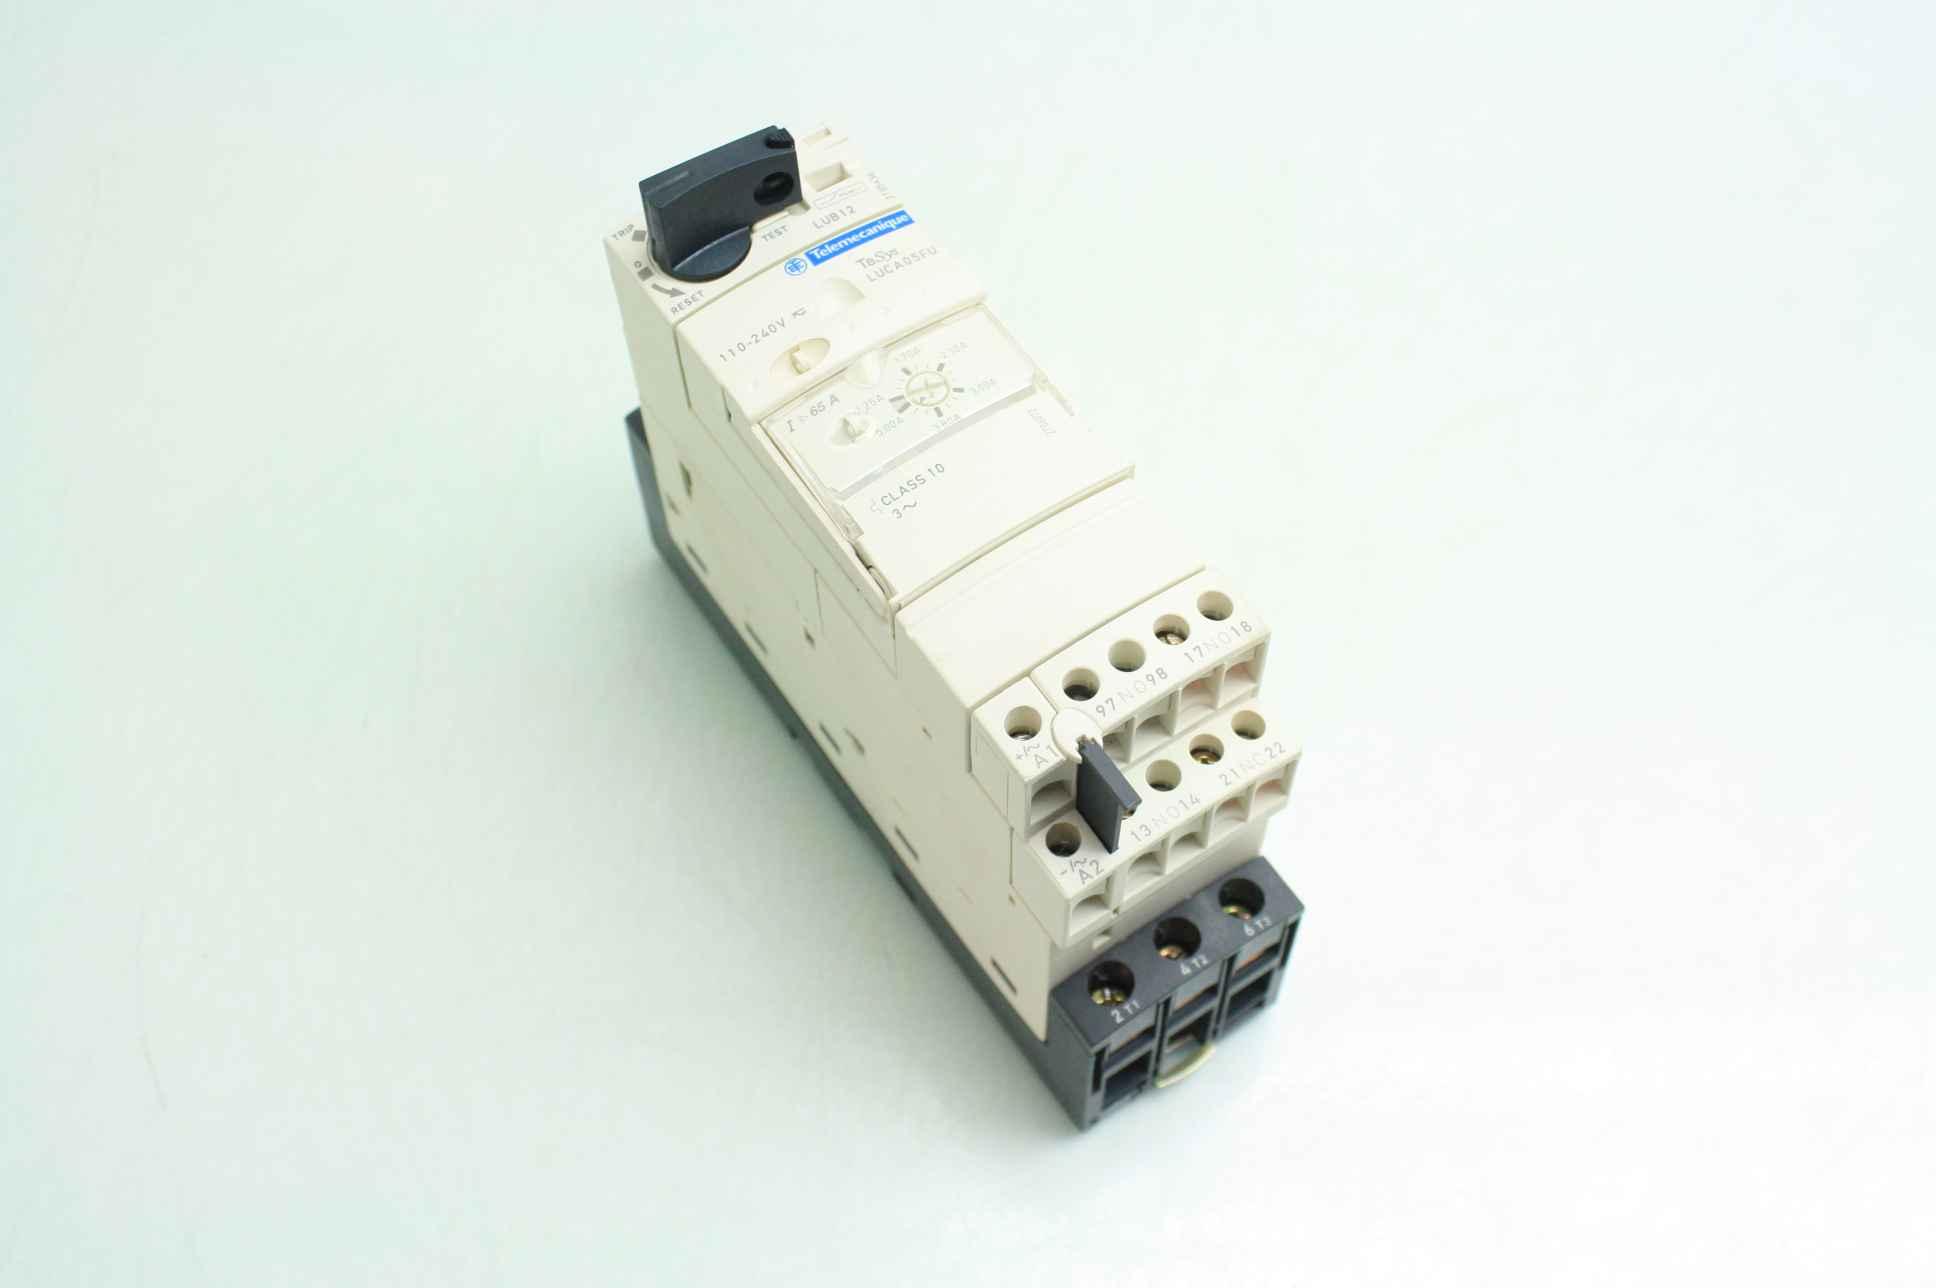 soft starter wiring diagram schneider alternator lub12 motor base 110 240v with luca05fu